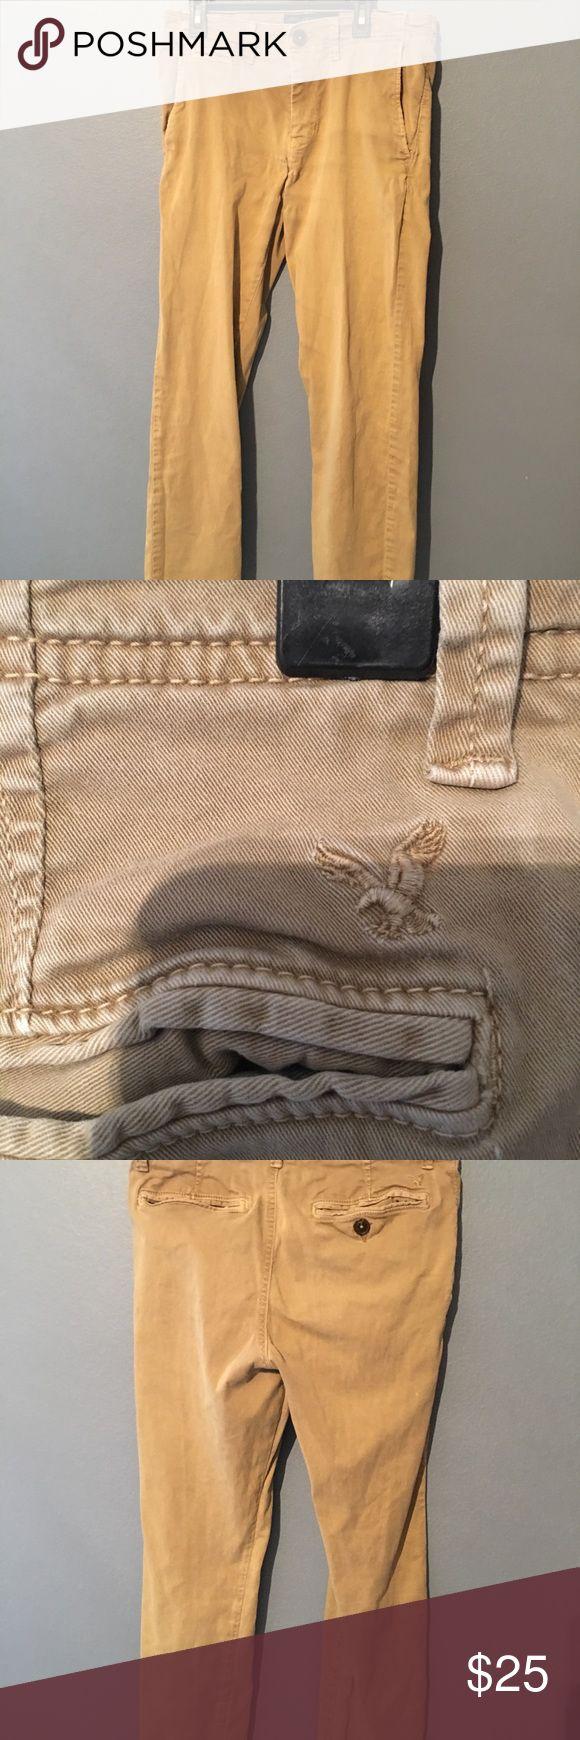 American Eagle men's Skinny Khaki pants Men's American eagle skinny khaki pants American Eagle Outfitters Pants Chinos & Khakis